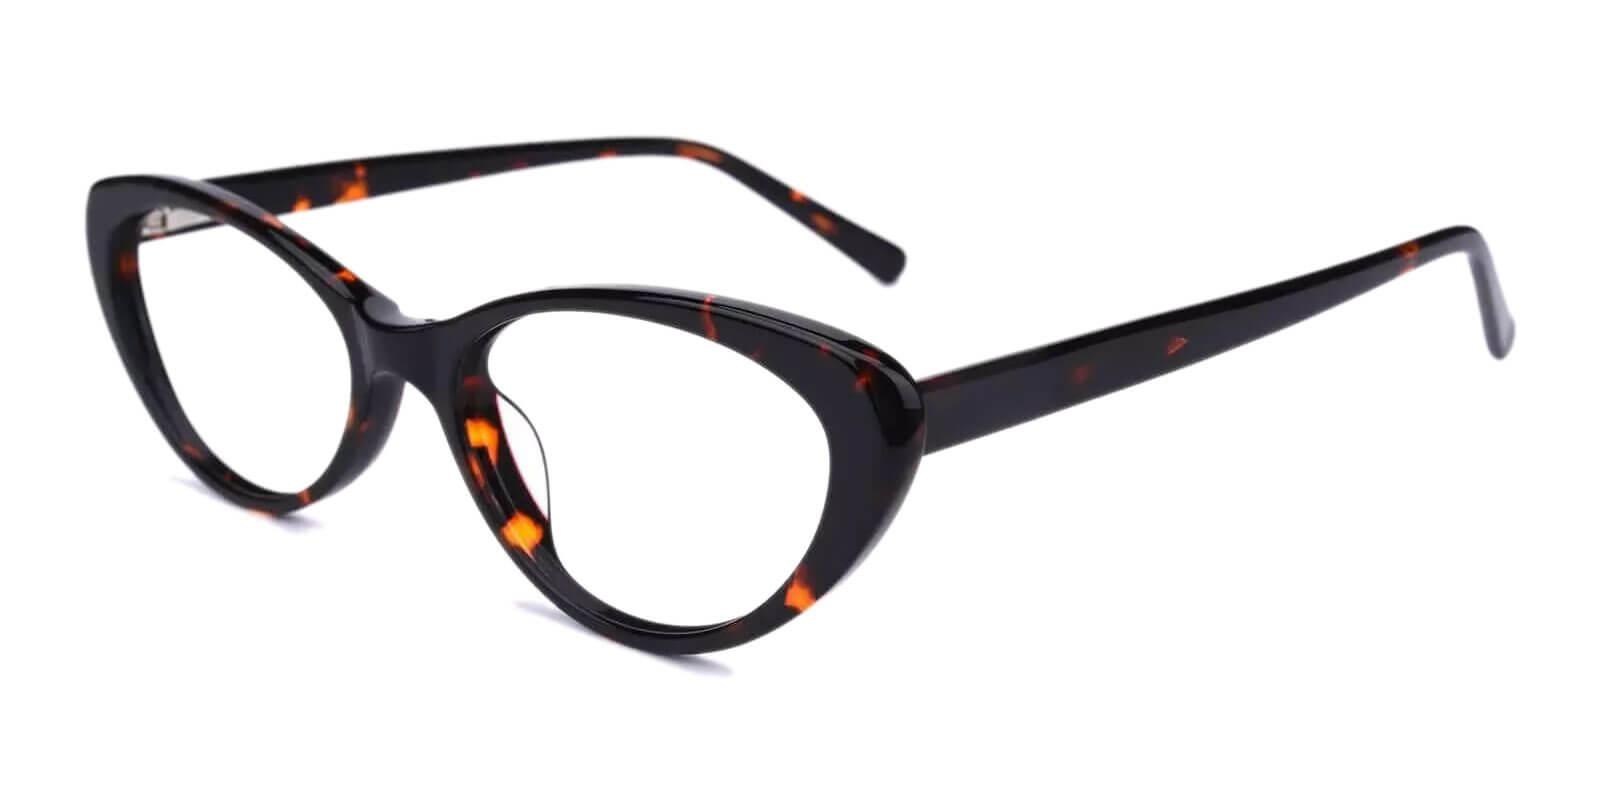 Elena Leopard Acetate Eyeglasses , UniversalBridgeFit Frames from ABBE Glasses